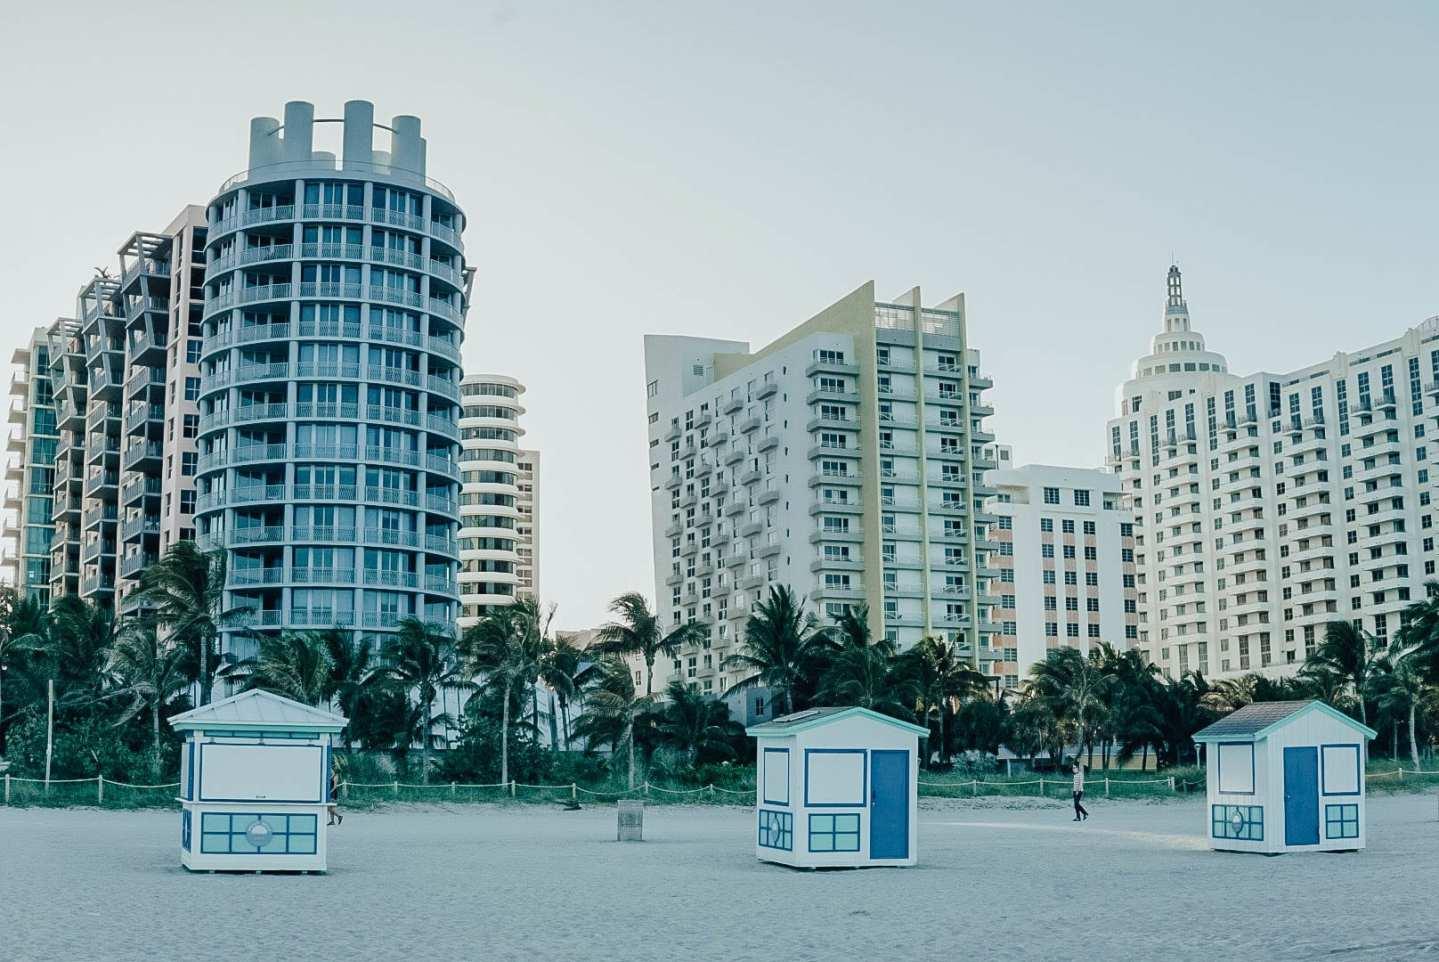 Family Friendly South Beach Hotel